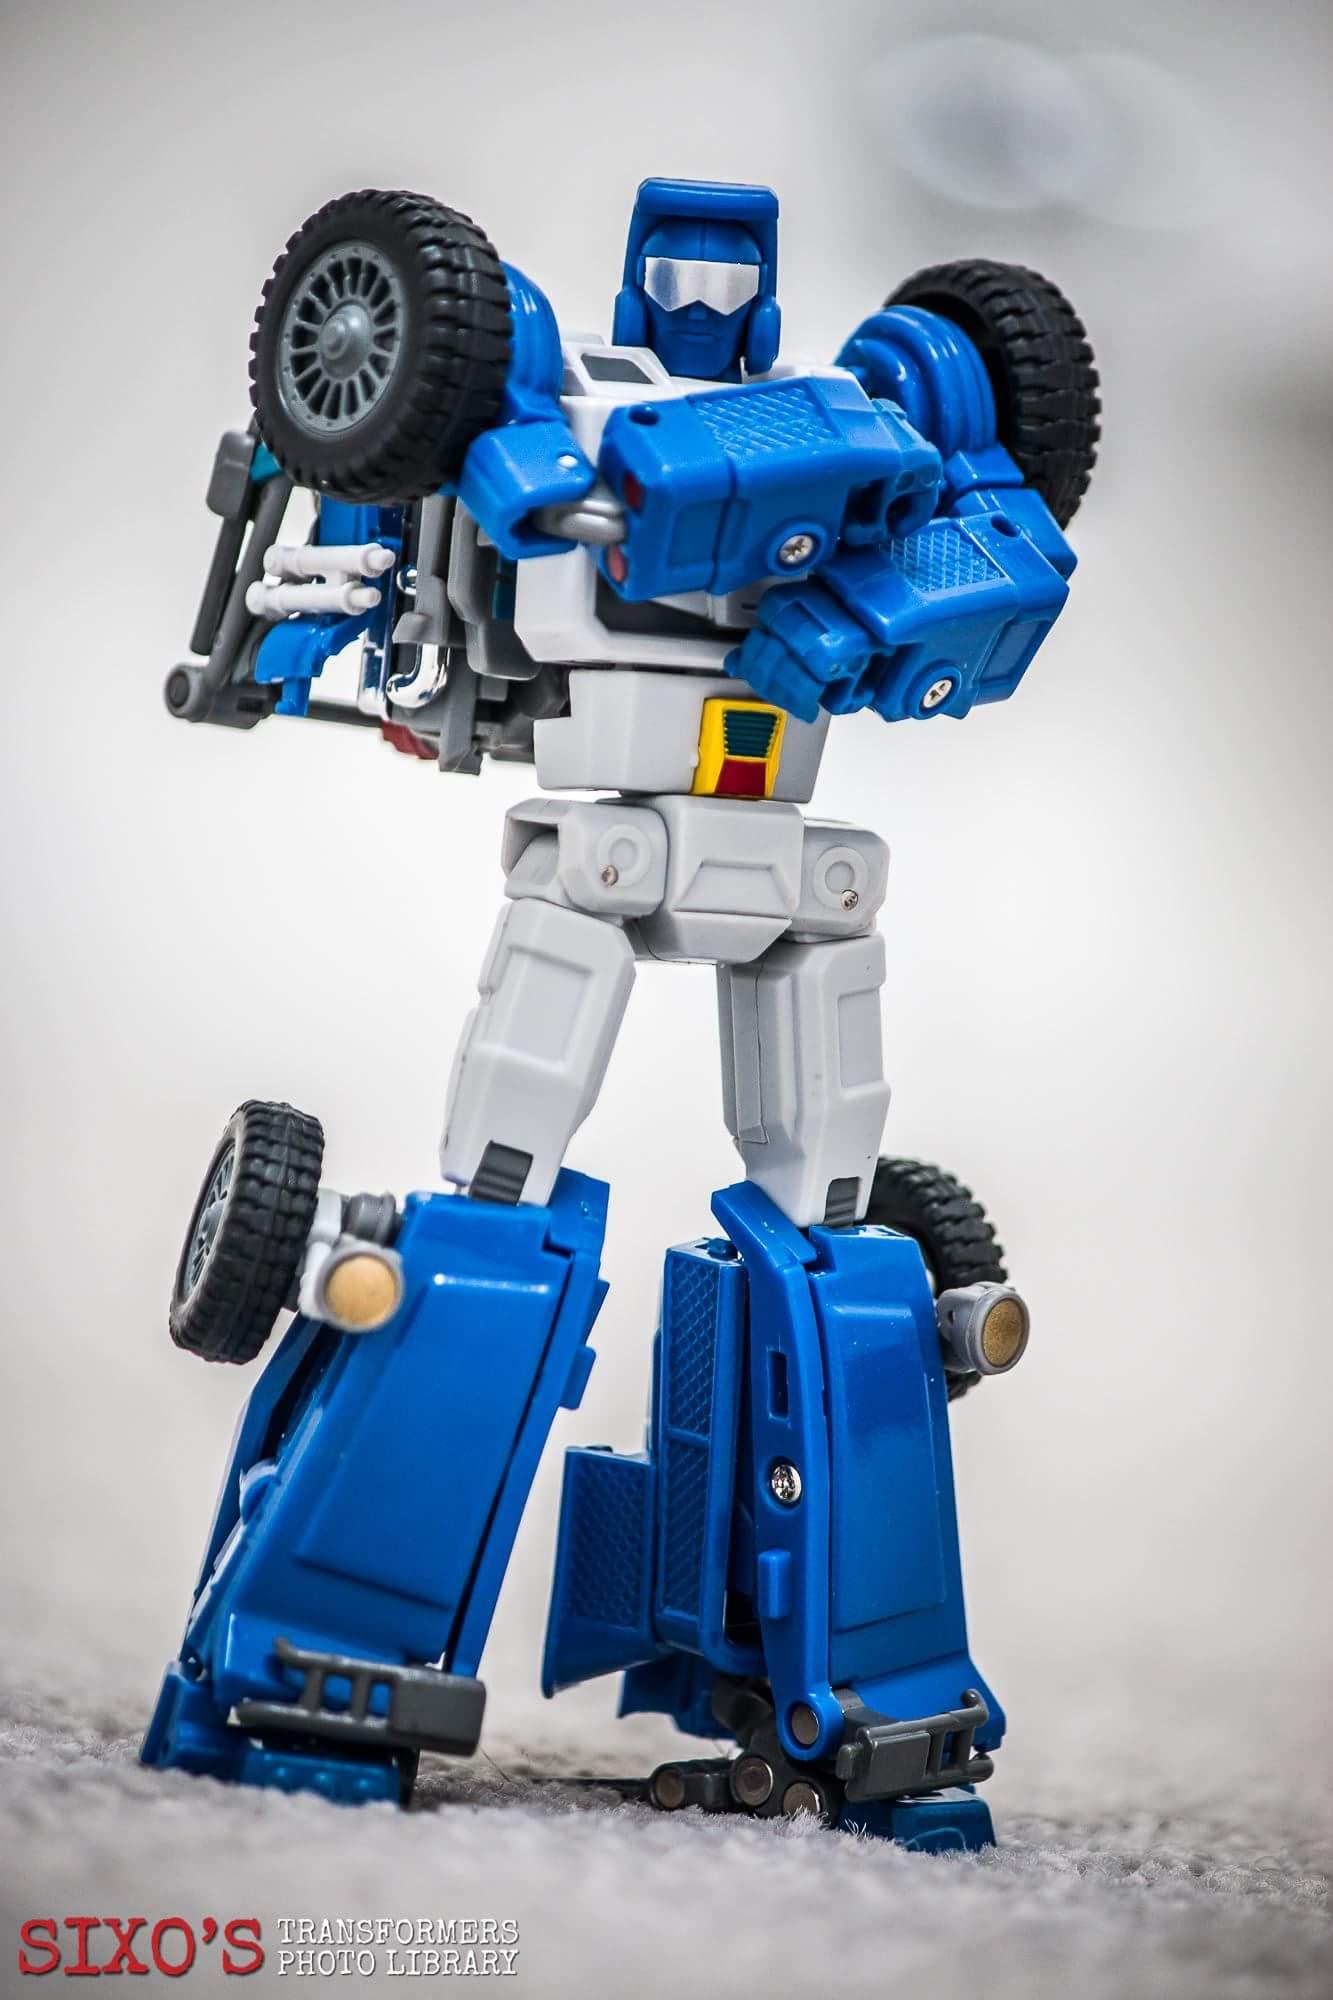 [X-Transbots] Produit Tiers - Minibots MP - Gamme MM - Page 6 Cb8pyqhh